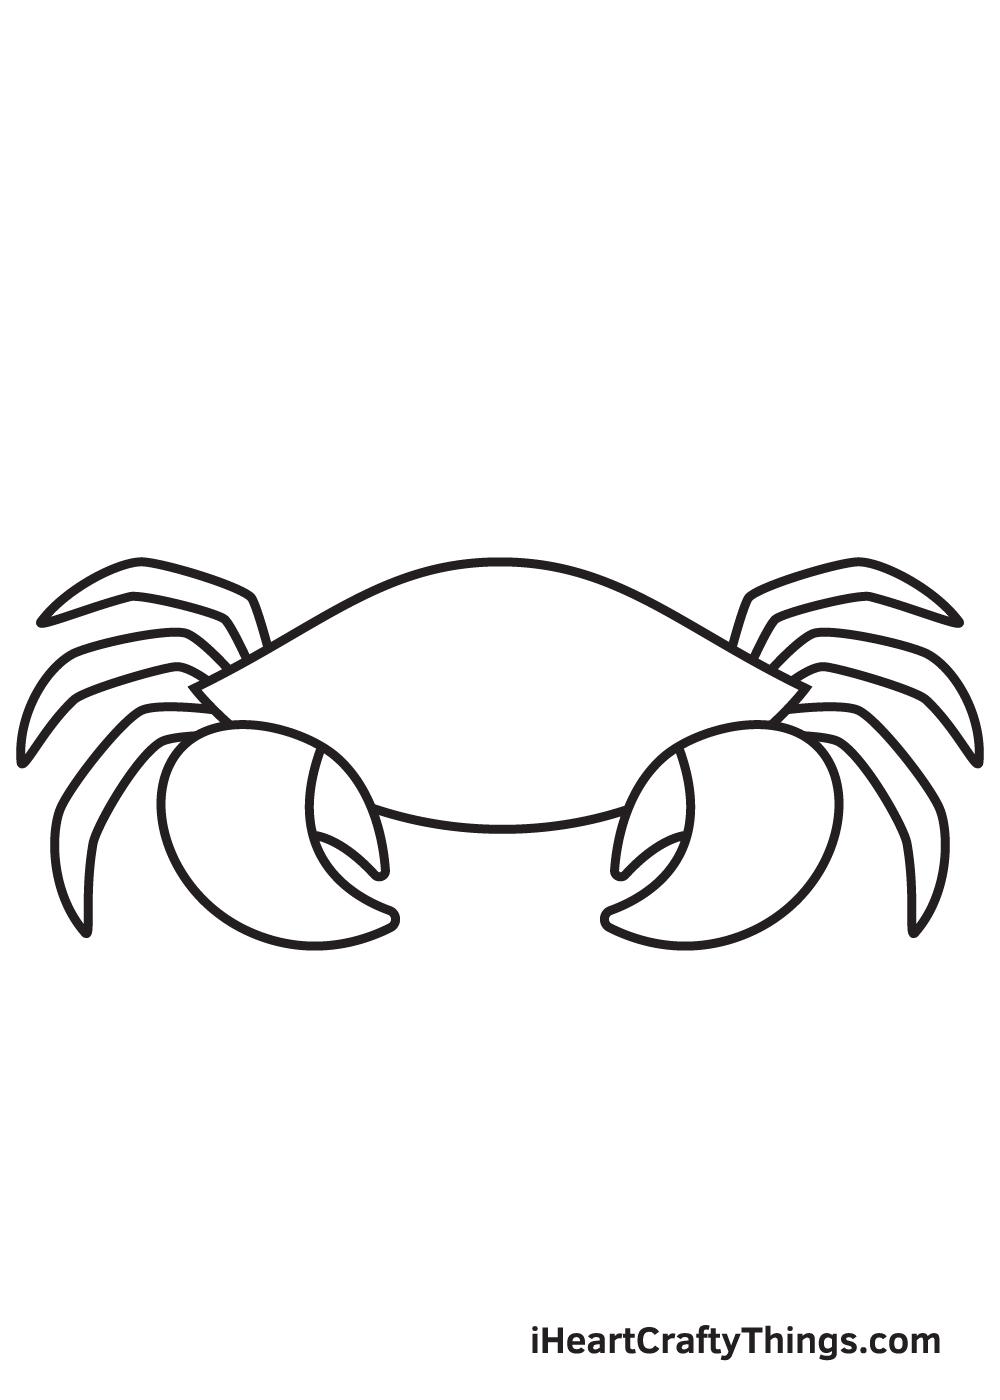 Crab Drawing – Step 5